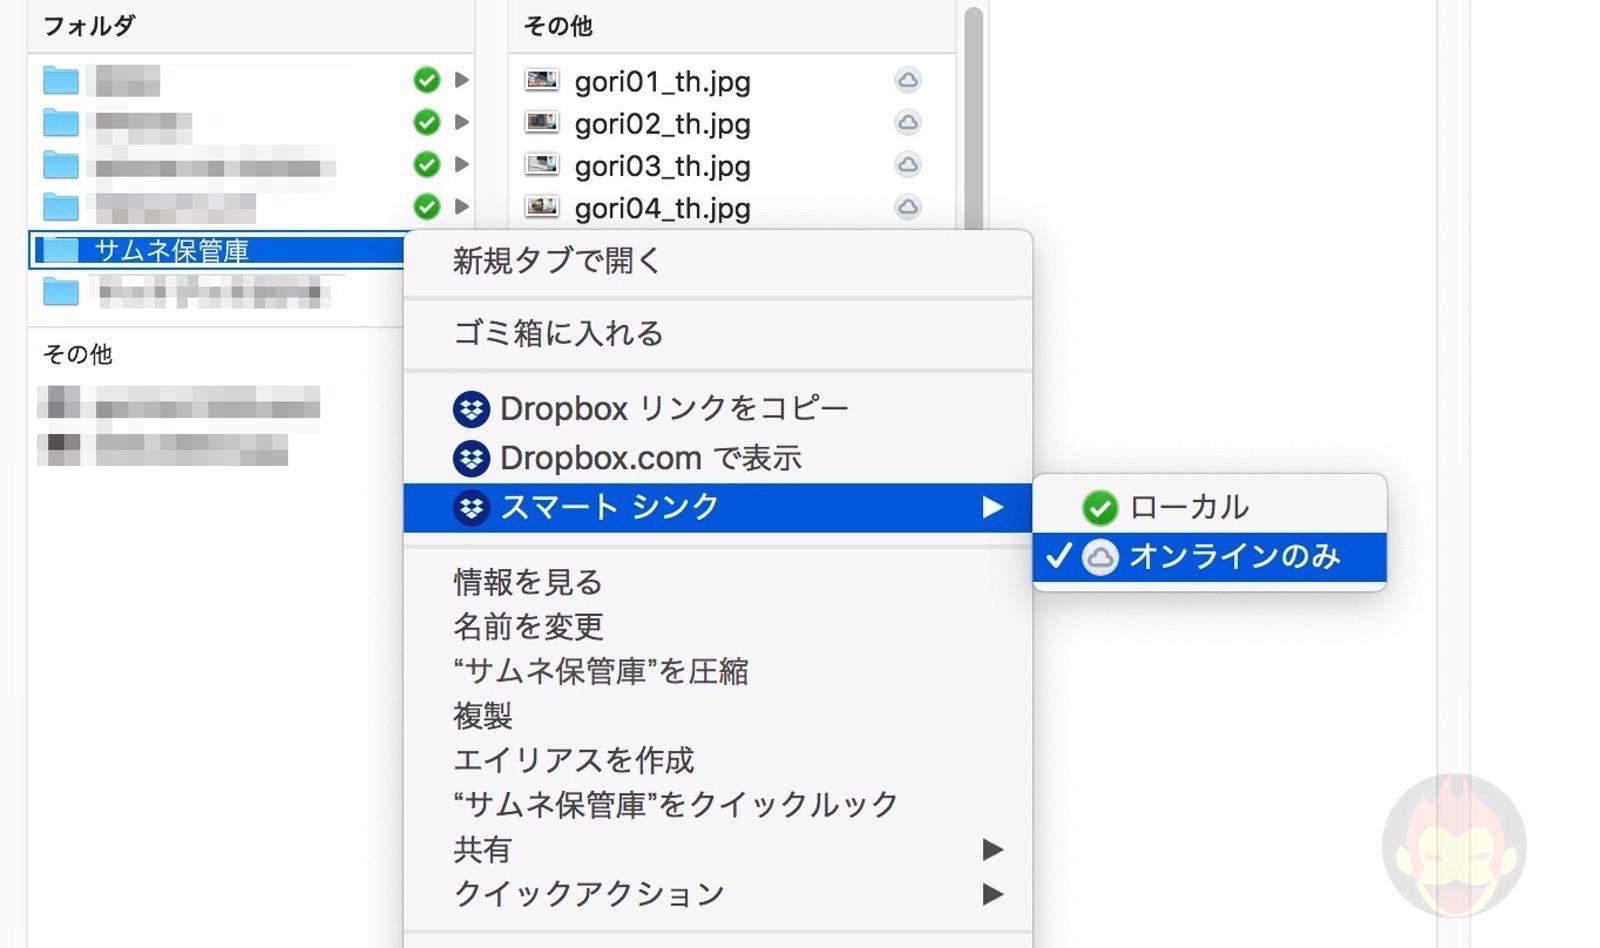 Dropbox SmartSync 21 2